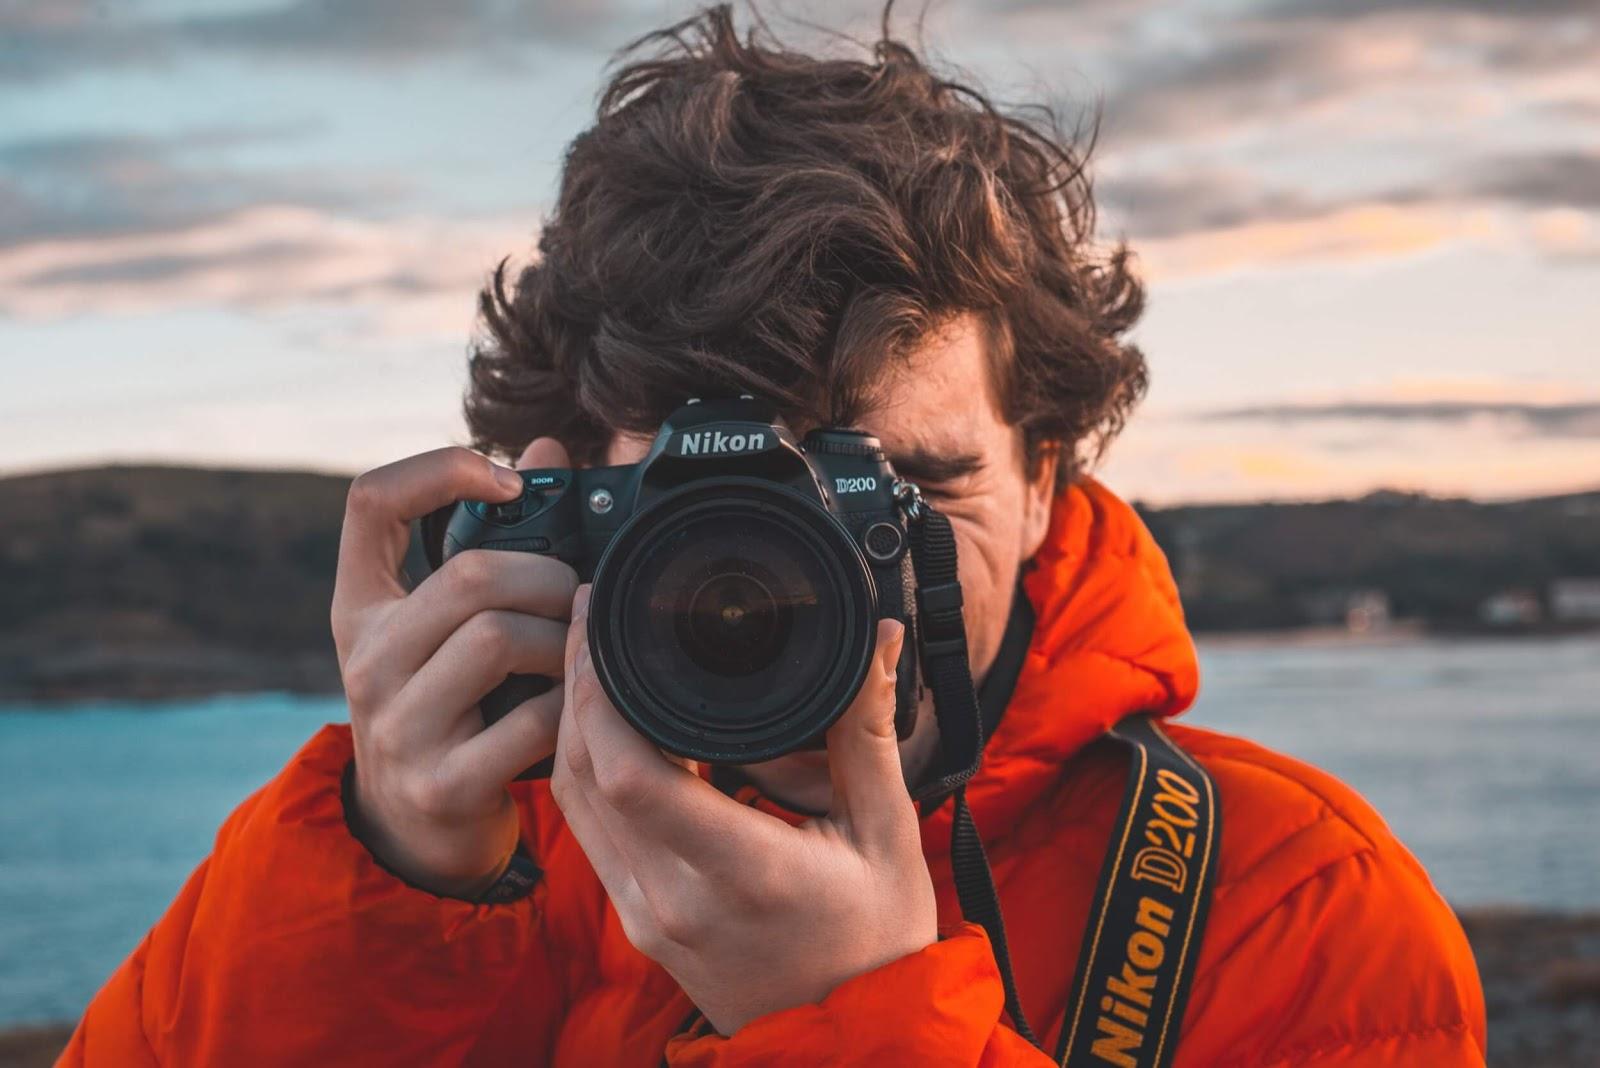 Camera Guy guillermo-sanchez-529739-unsplash.jpg